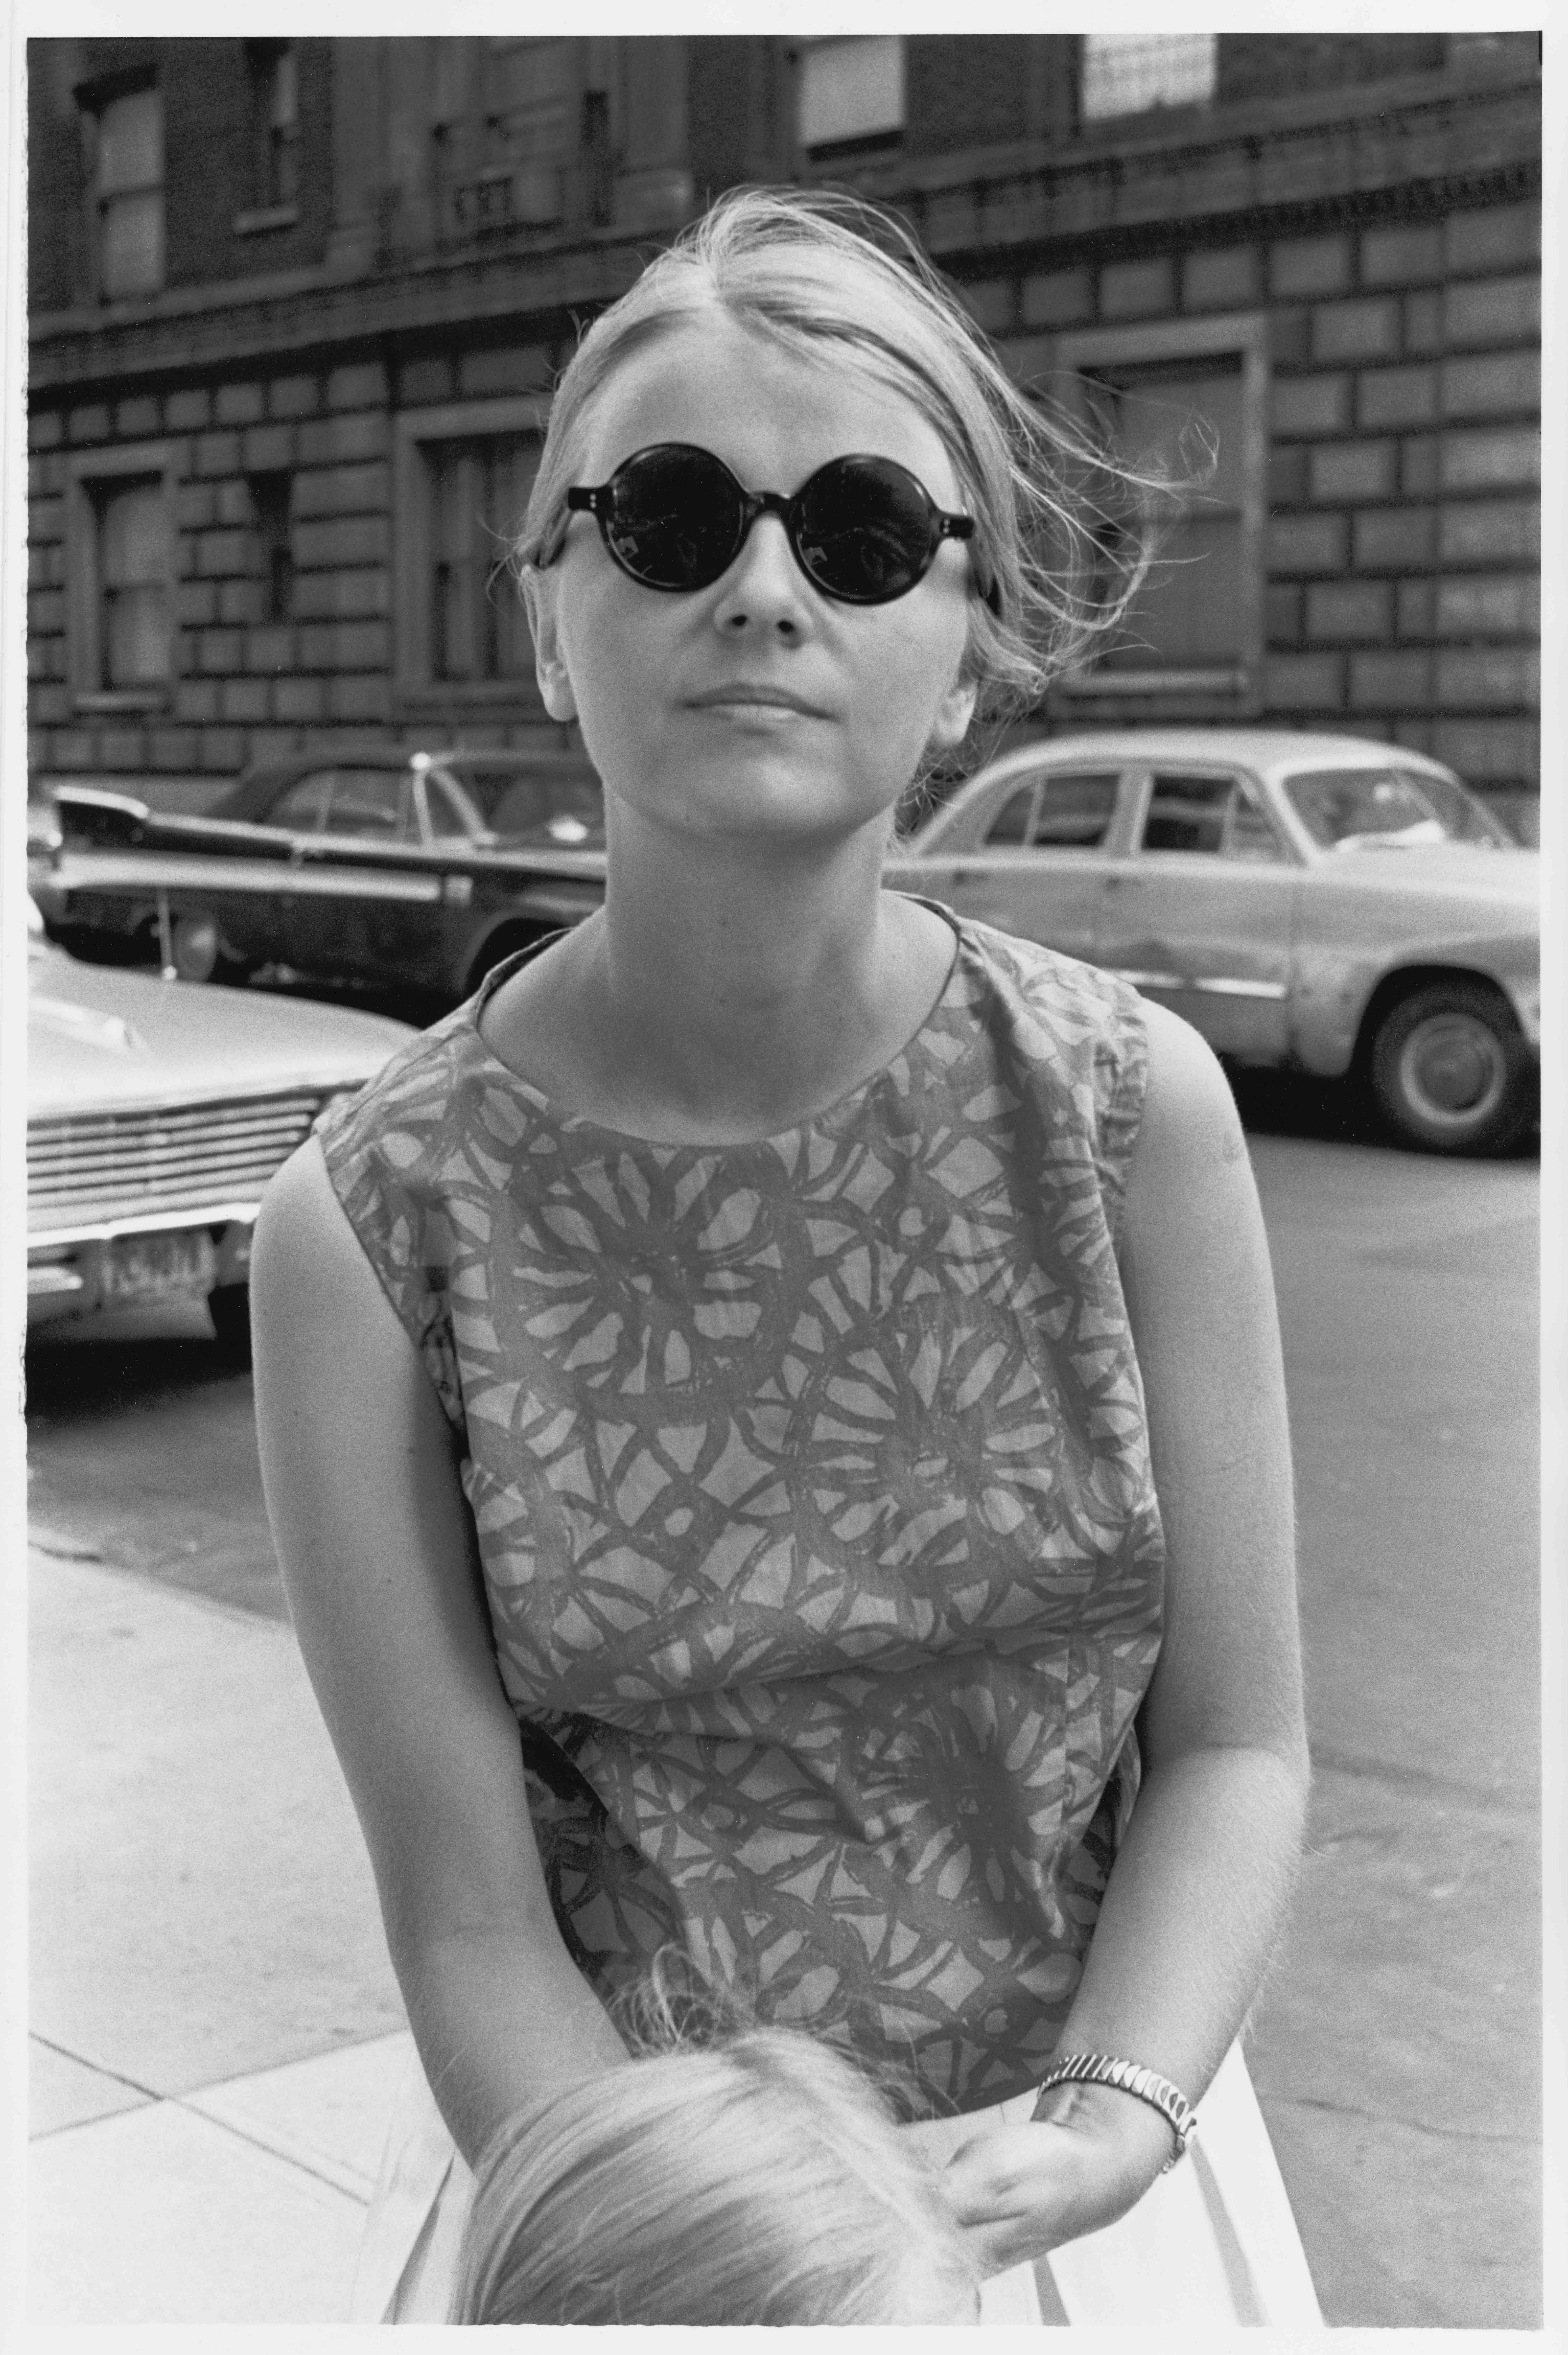 Monika in sunglasses, 1963